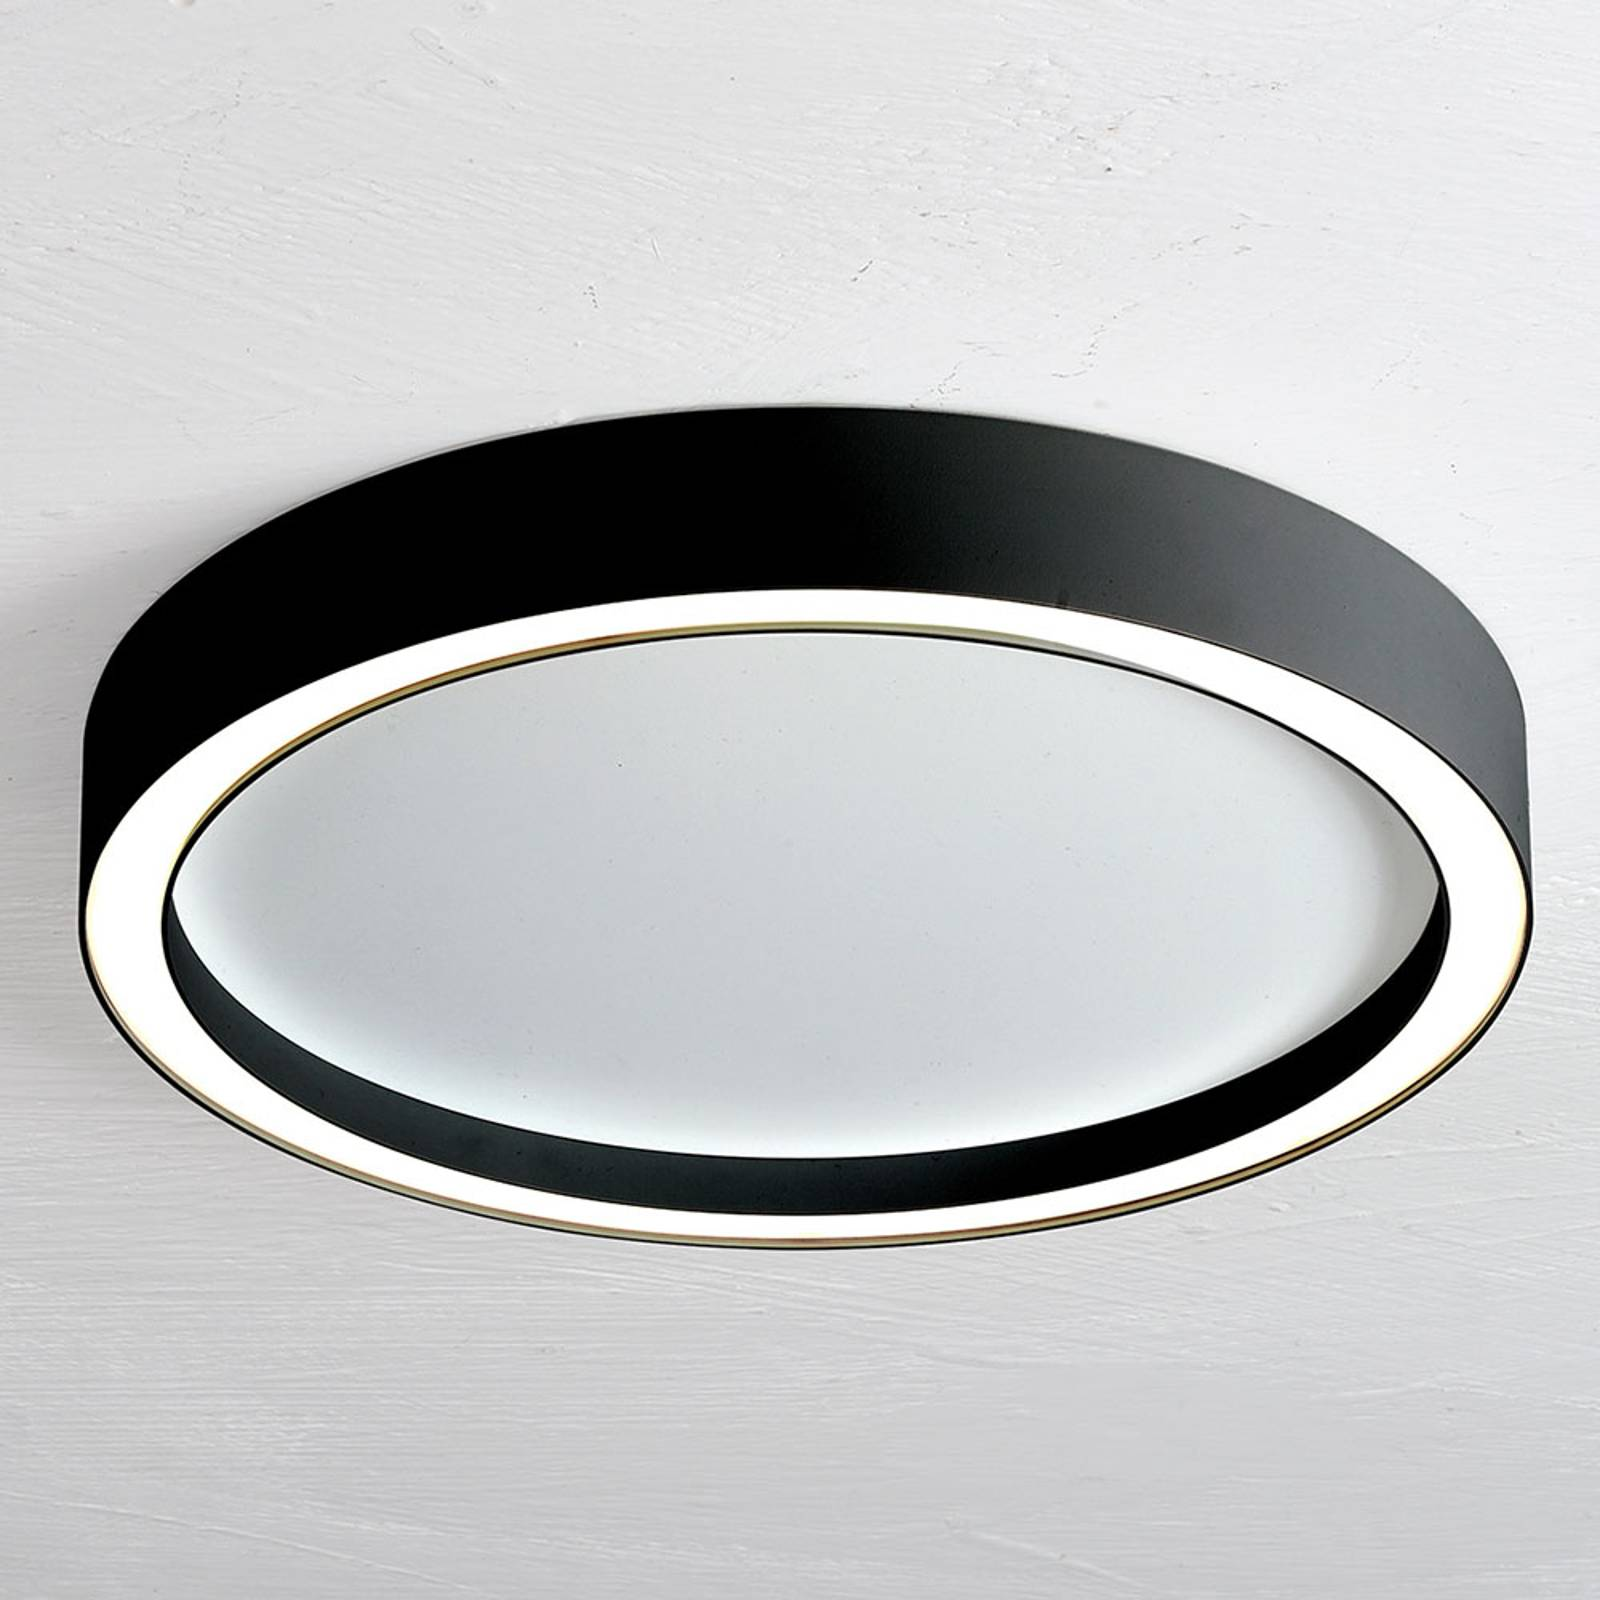 Bopp Aura LED plafondlamp Ø 55cm wit/zwart